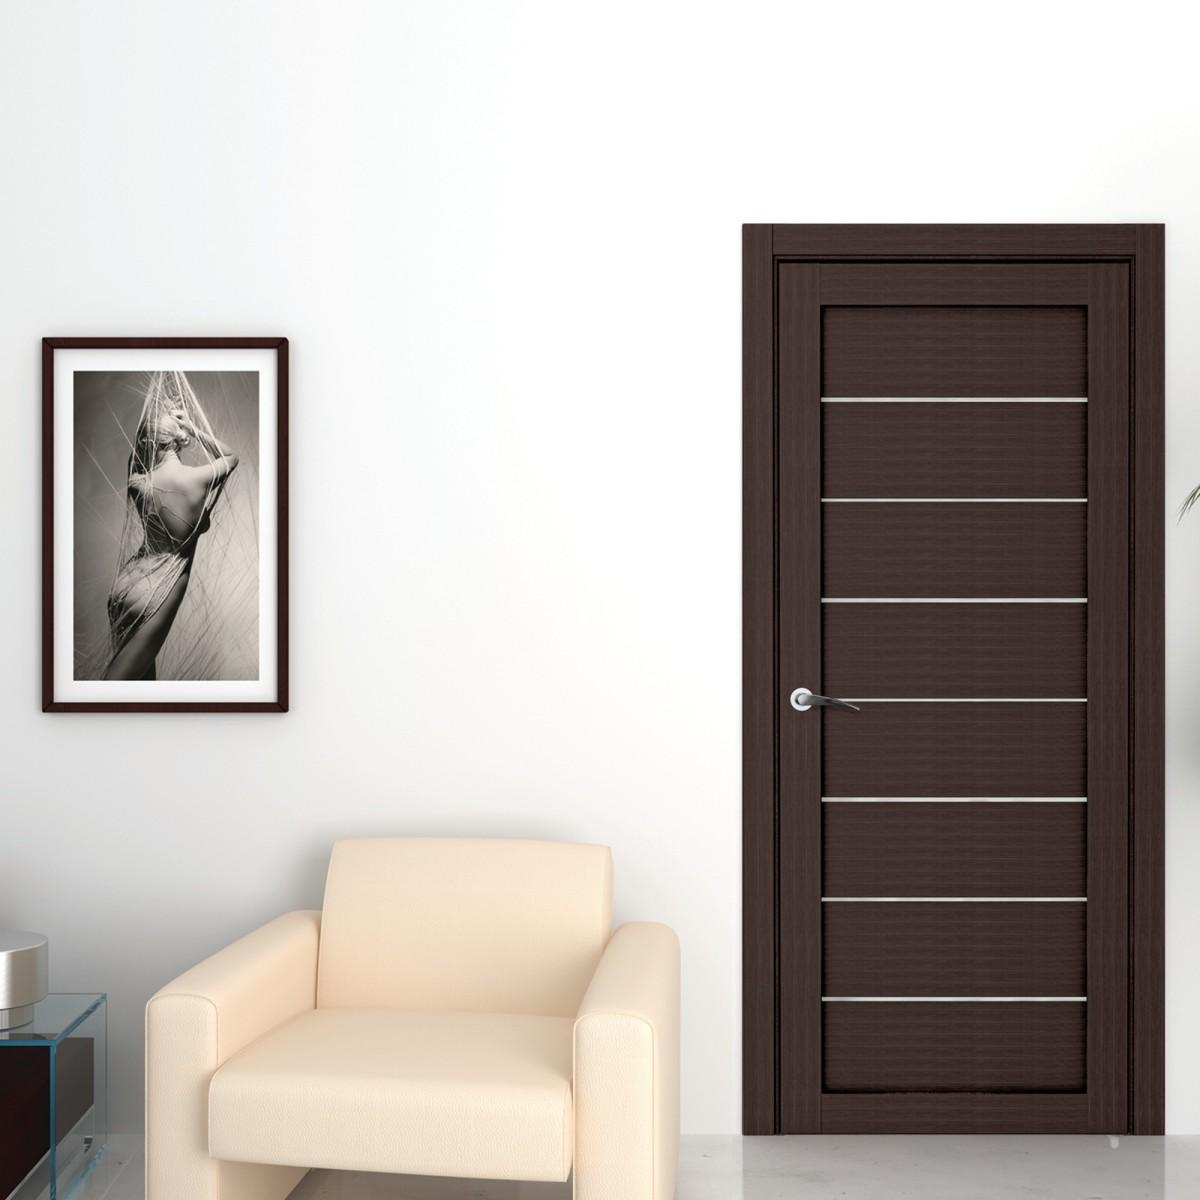 Дверь Межкомнатная Глухая Сабрина 90x200 Ламинация Цвет Мокко С Фурнитурой